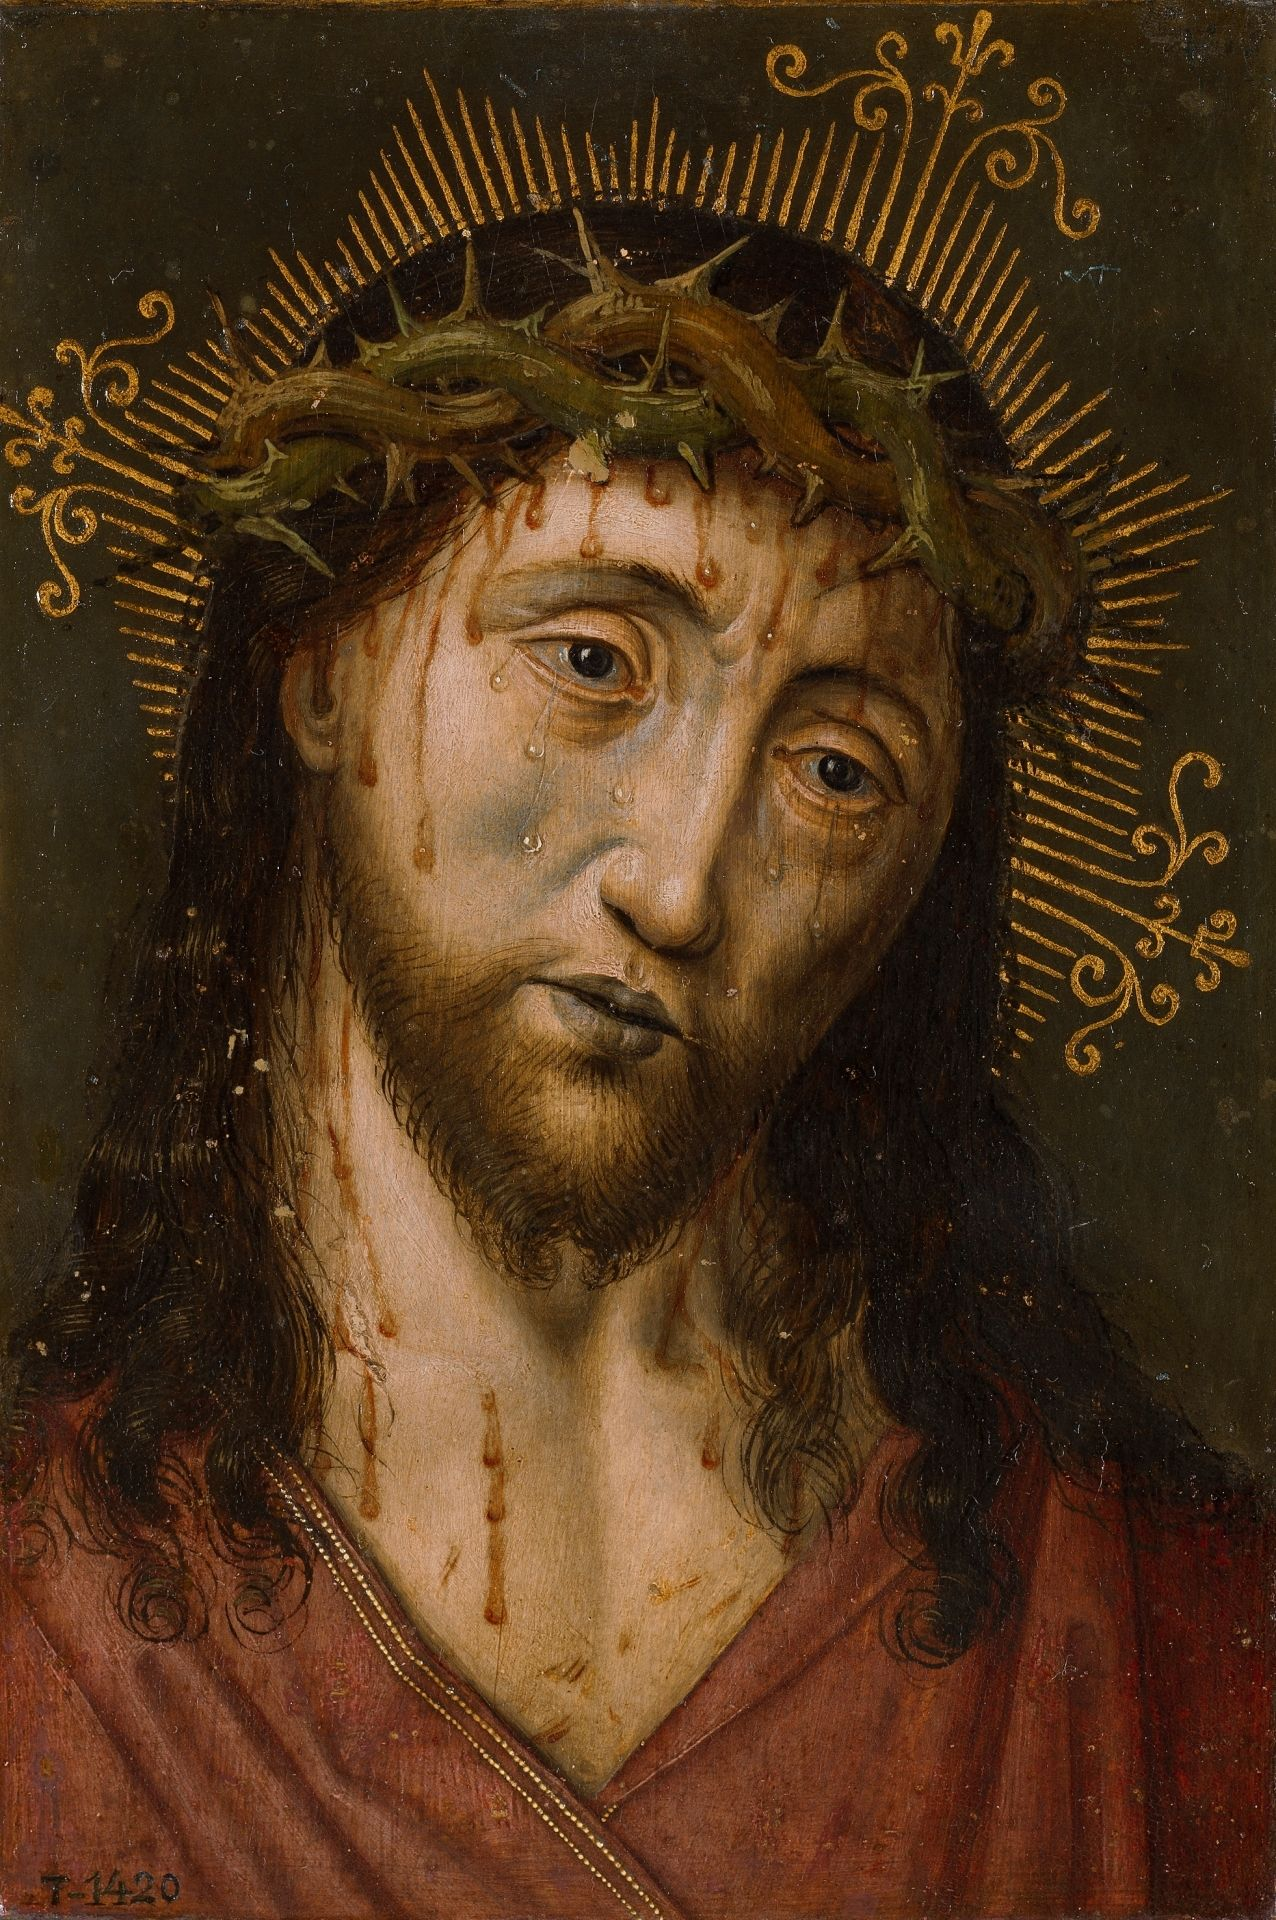 Christ Cristo 16th Century Disciple Of Albert Bouts Museo Del Prado Jesus Pictures Of Christ Catholic Art Jesus Images